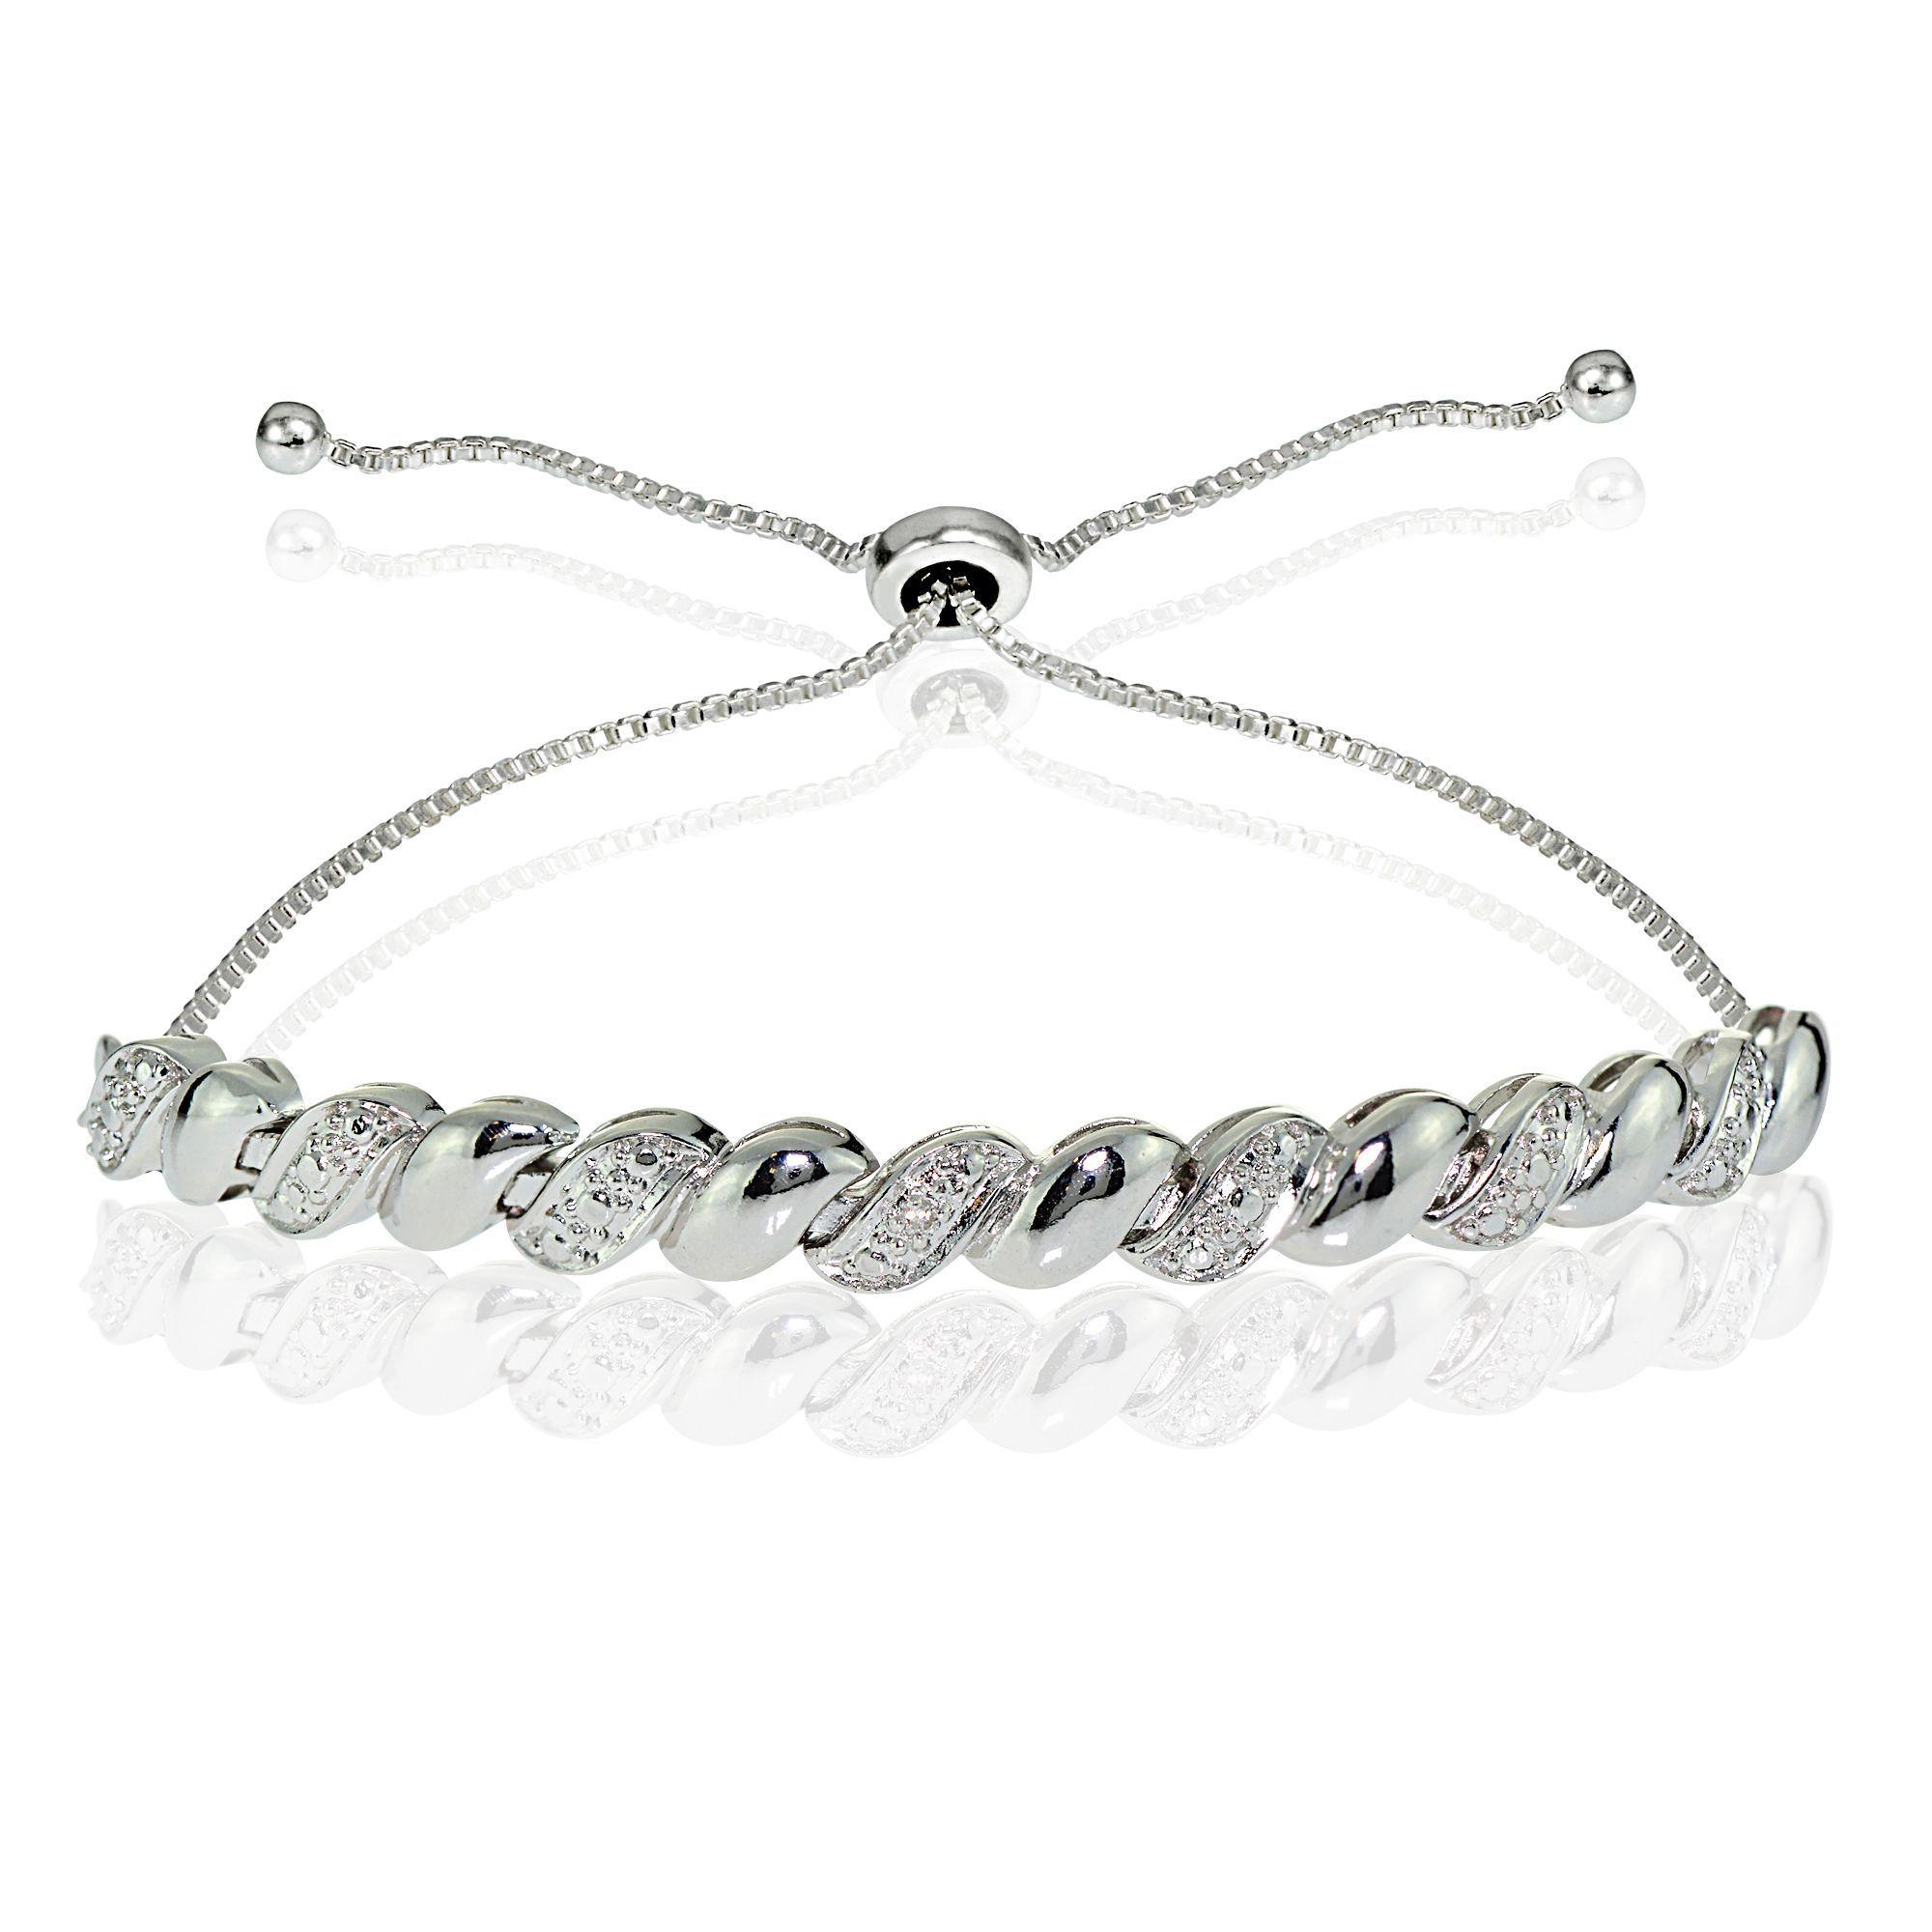 Rose gold finish round cut created diamond chain infinity design bangle giftbox